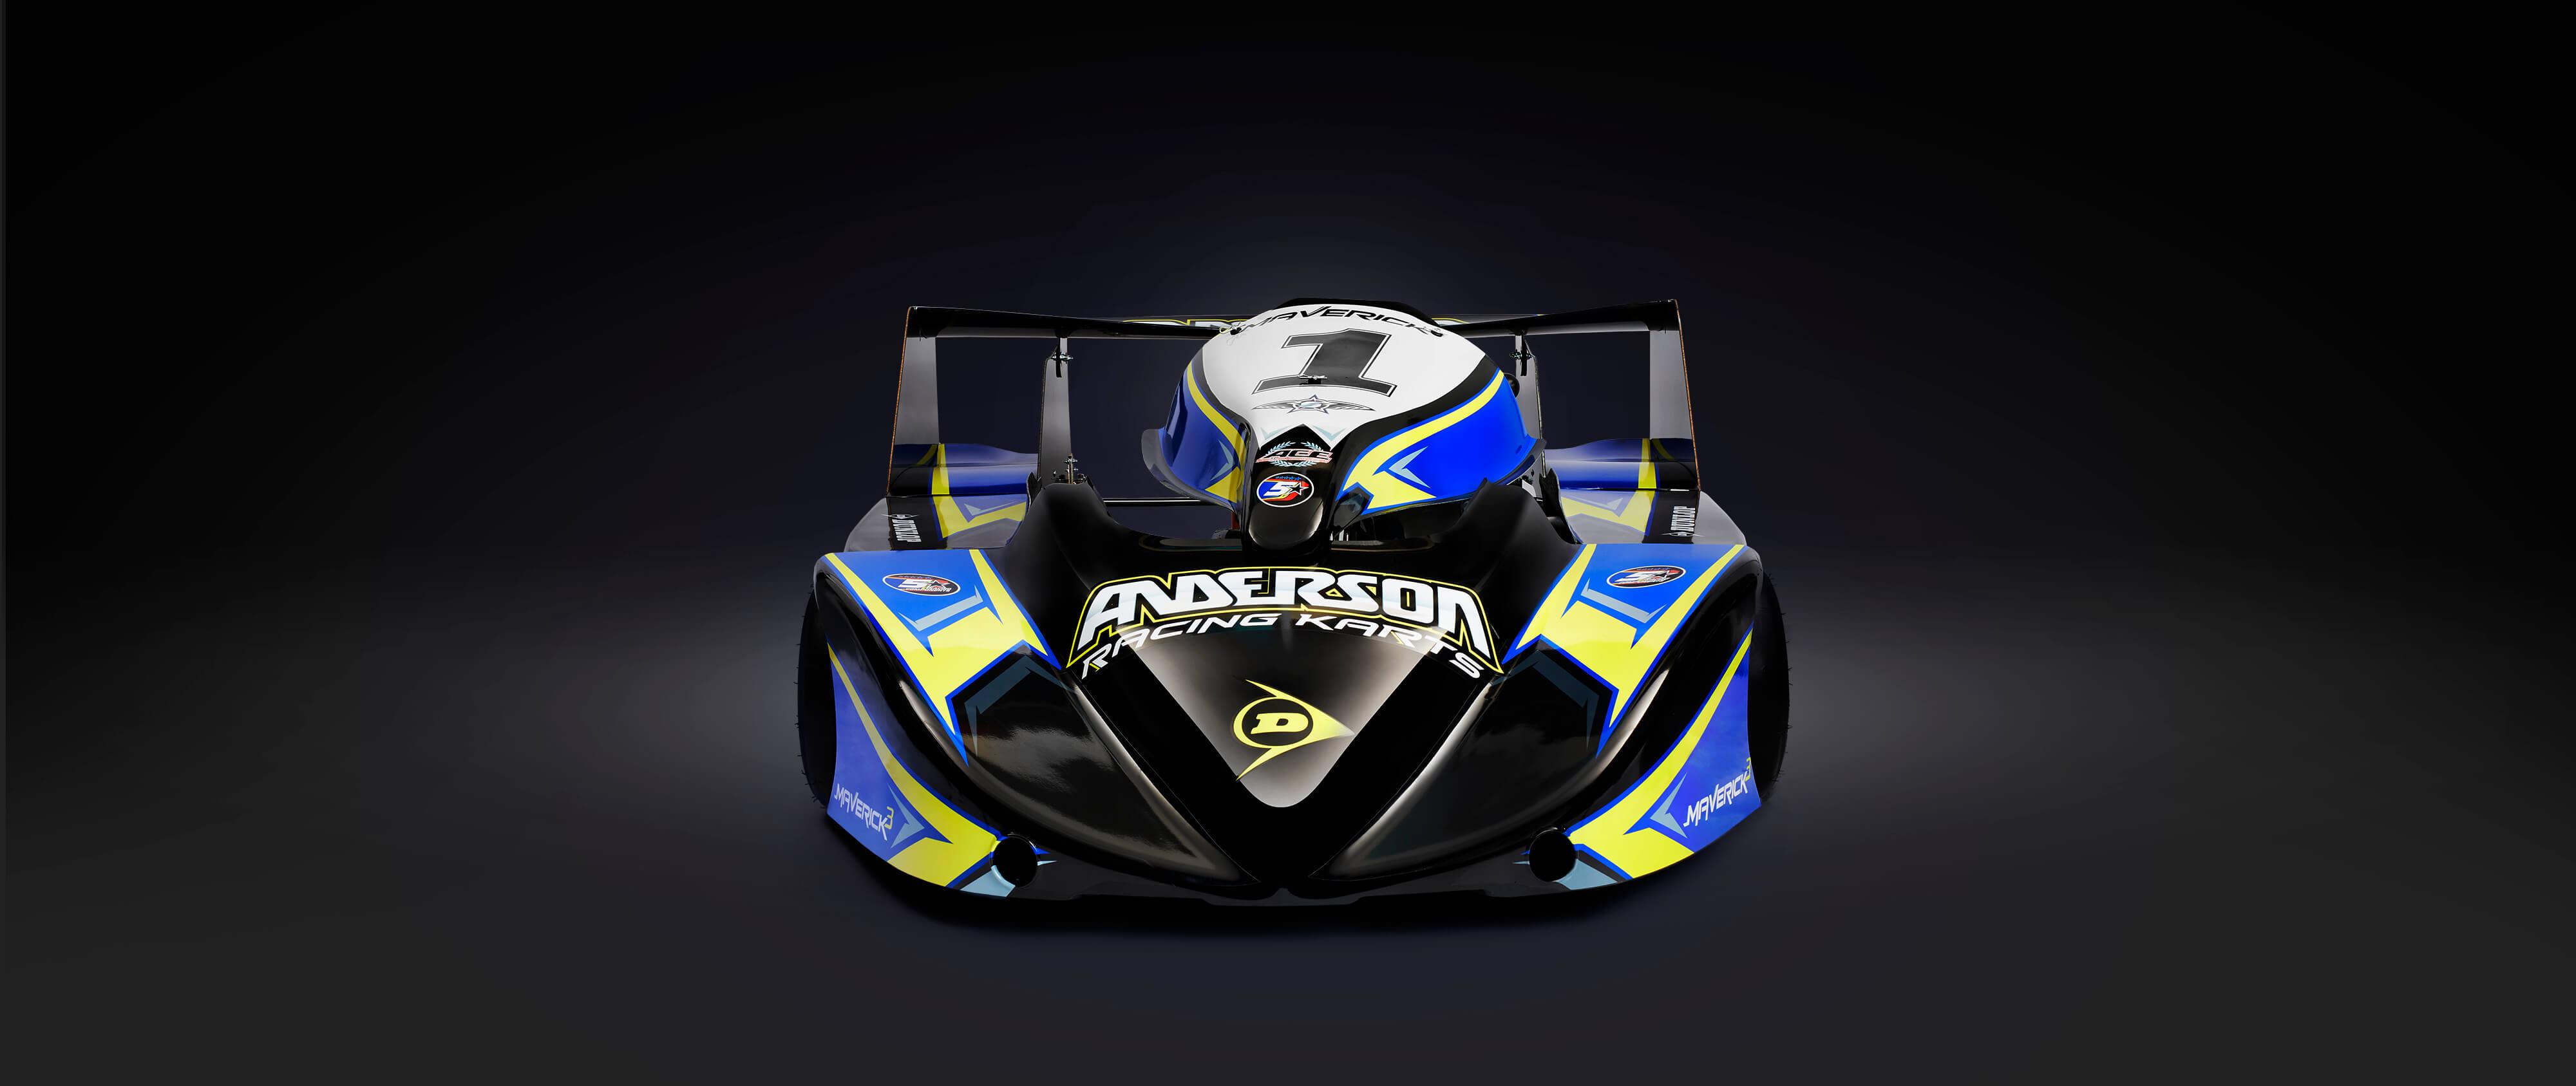 Anderson 250 Mono Superkart